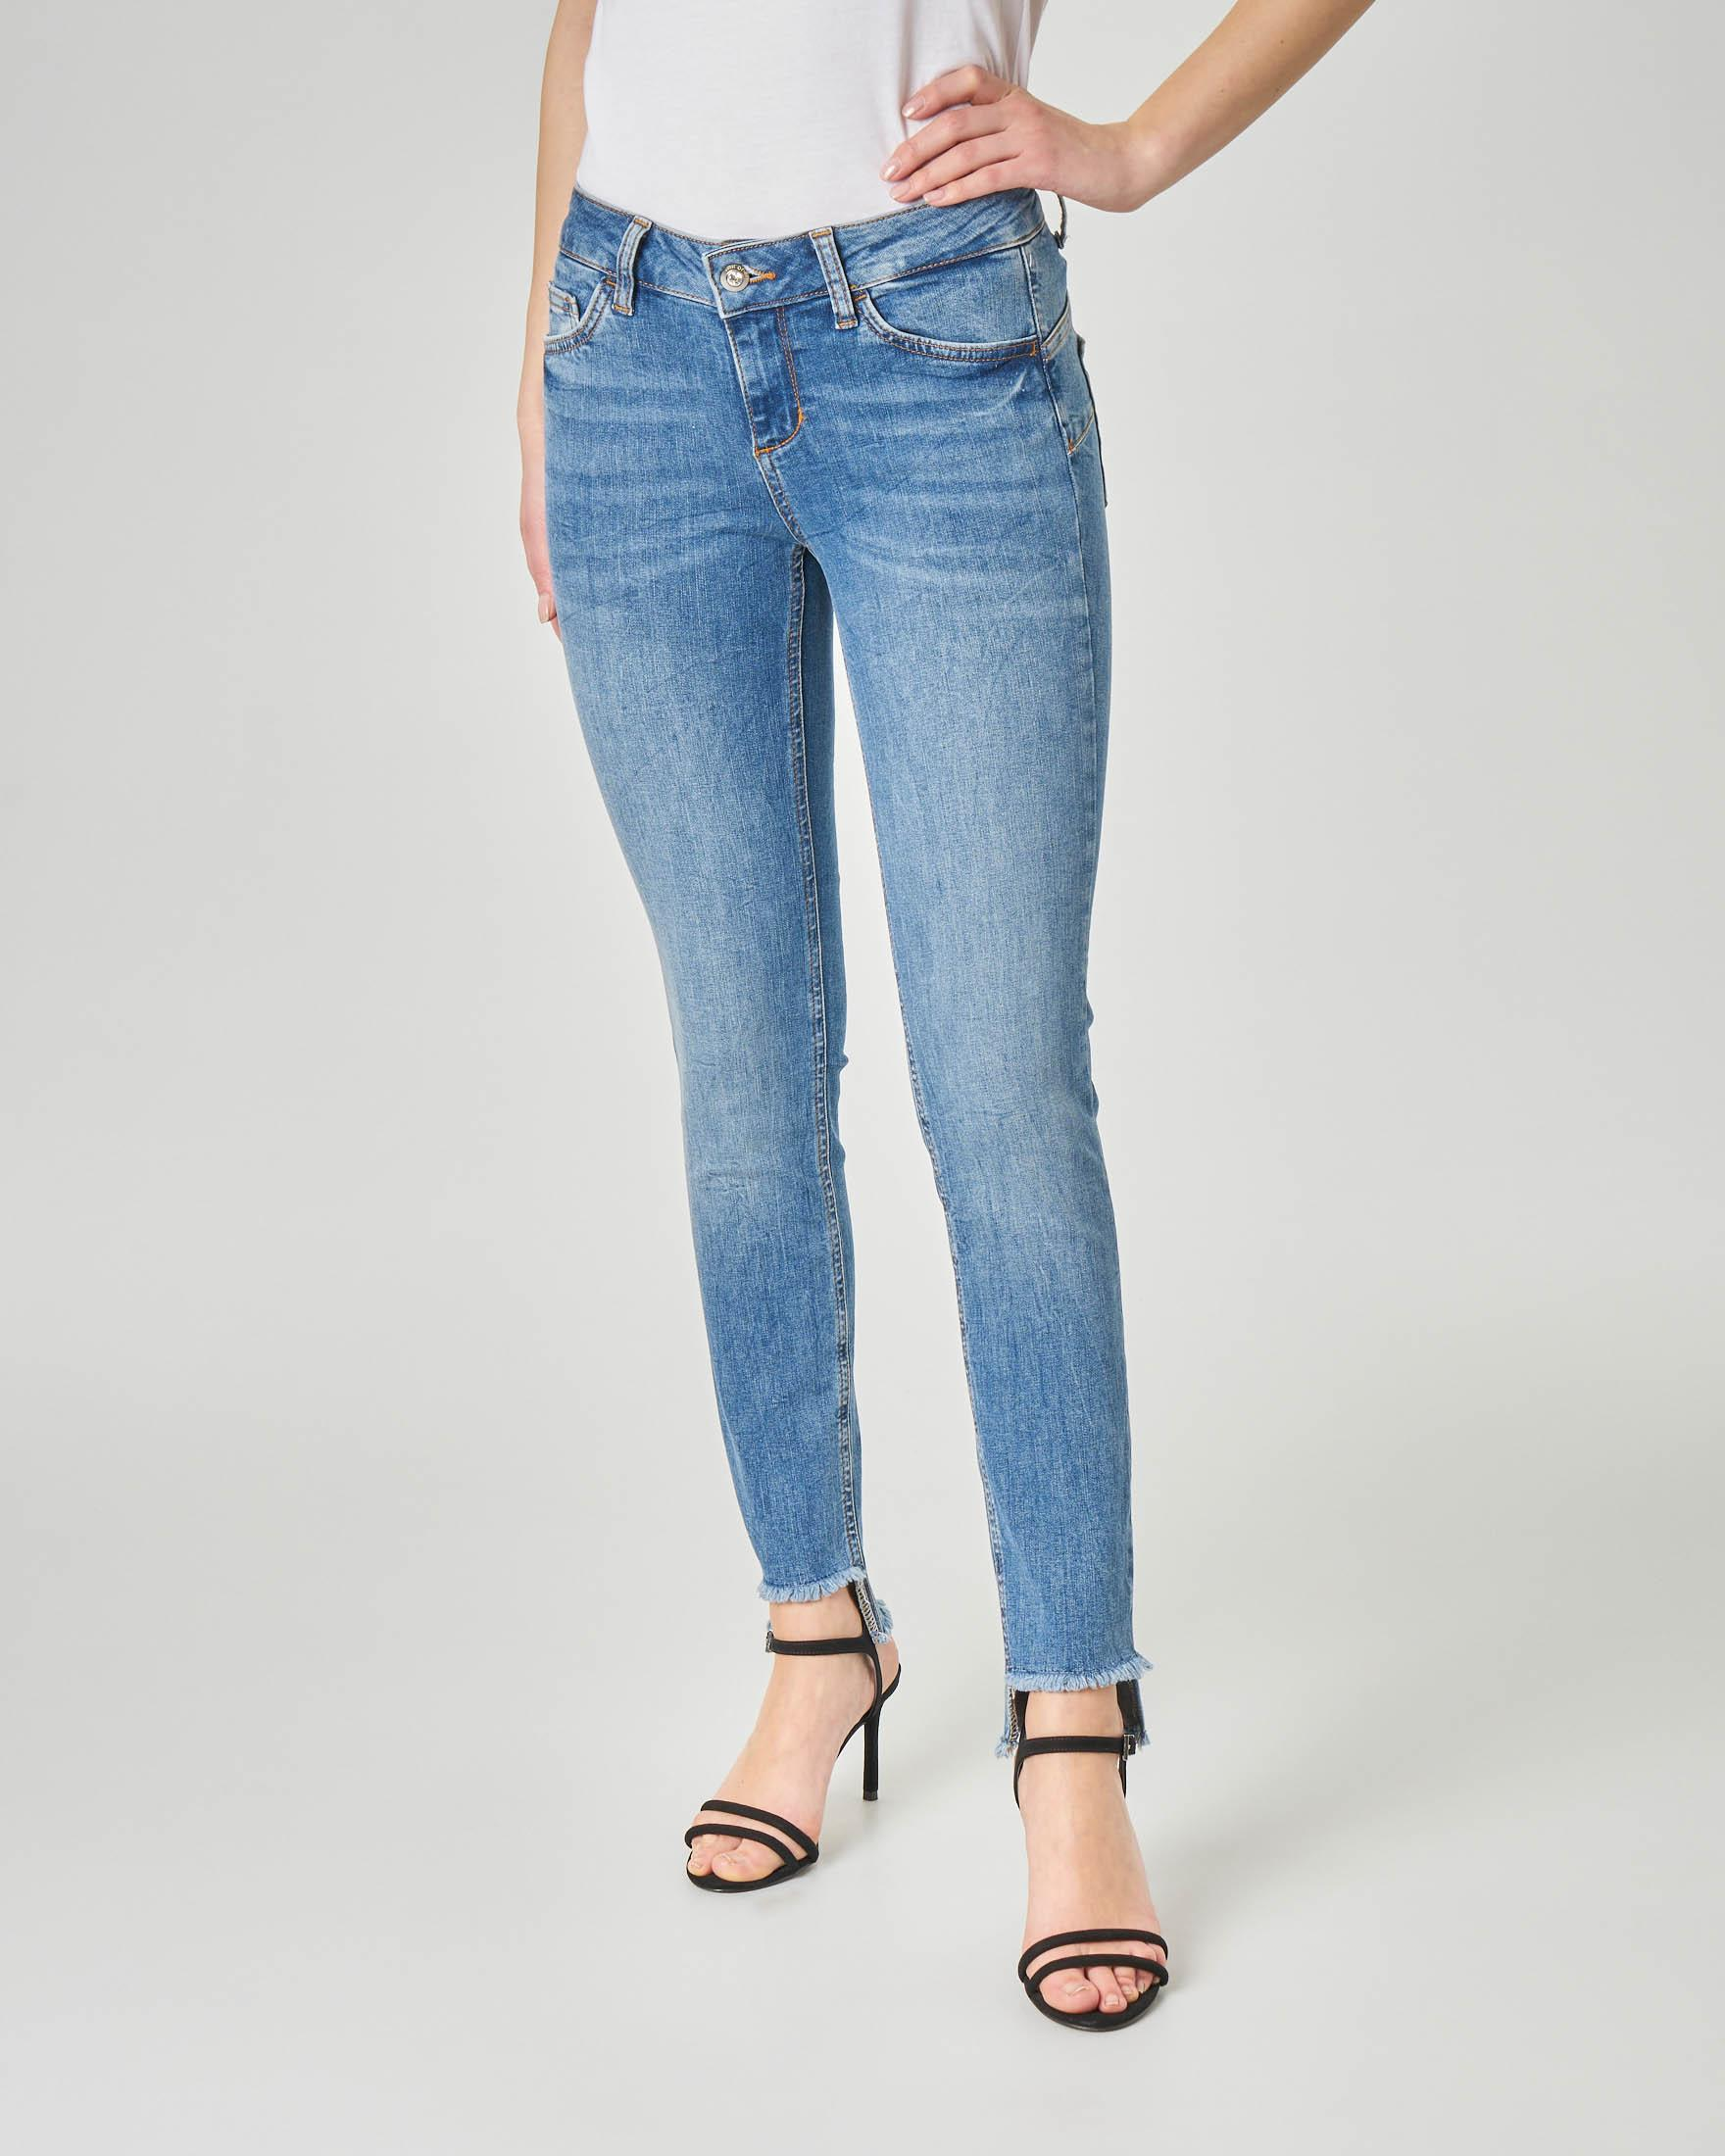 Jeans skinny blu délavé con orli asimmetrici sfrangiati